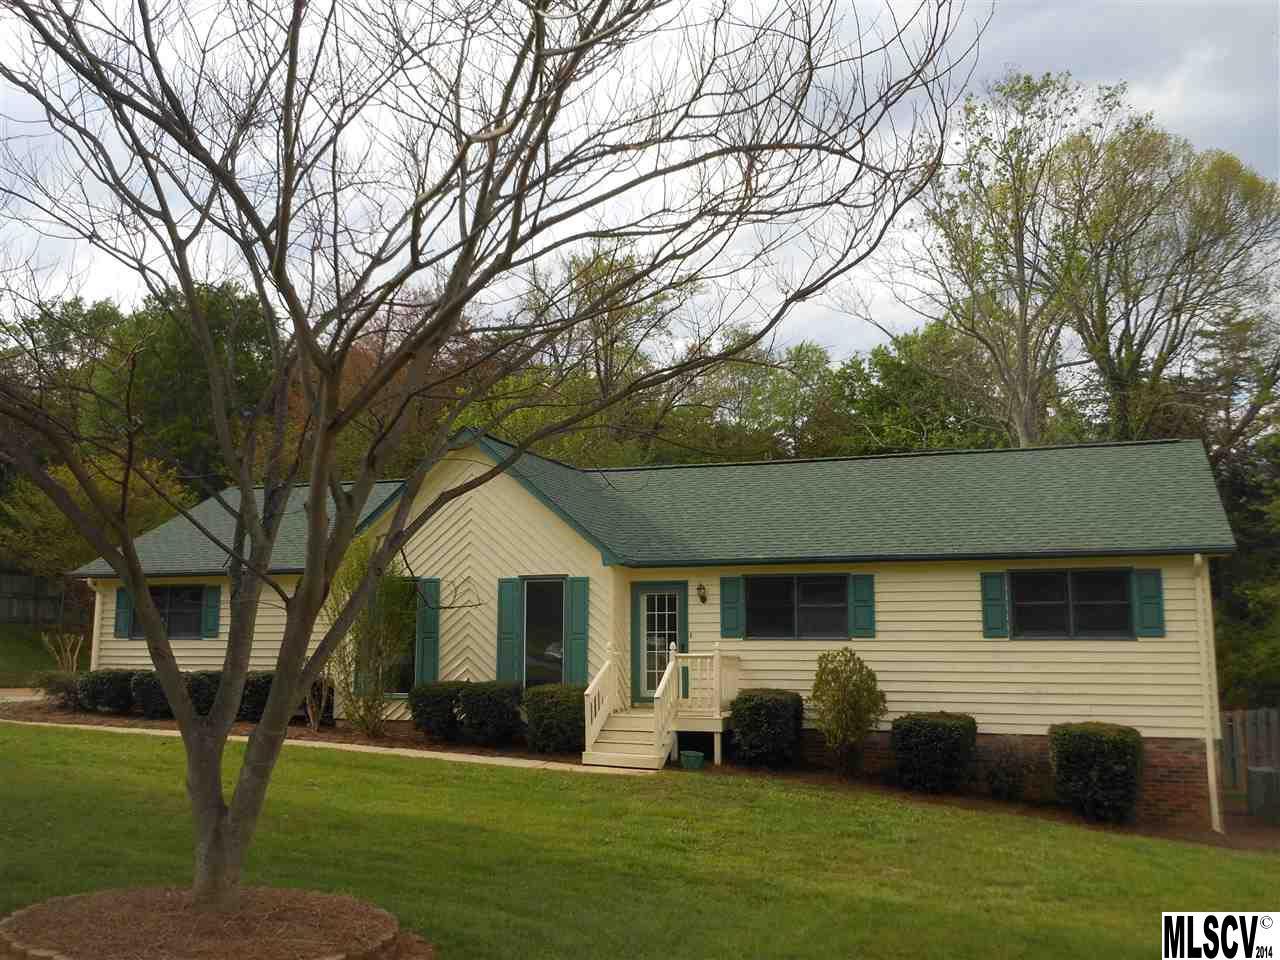 Real Estate for Sale, ListingId: 32413960, Hickory,NC28601